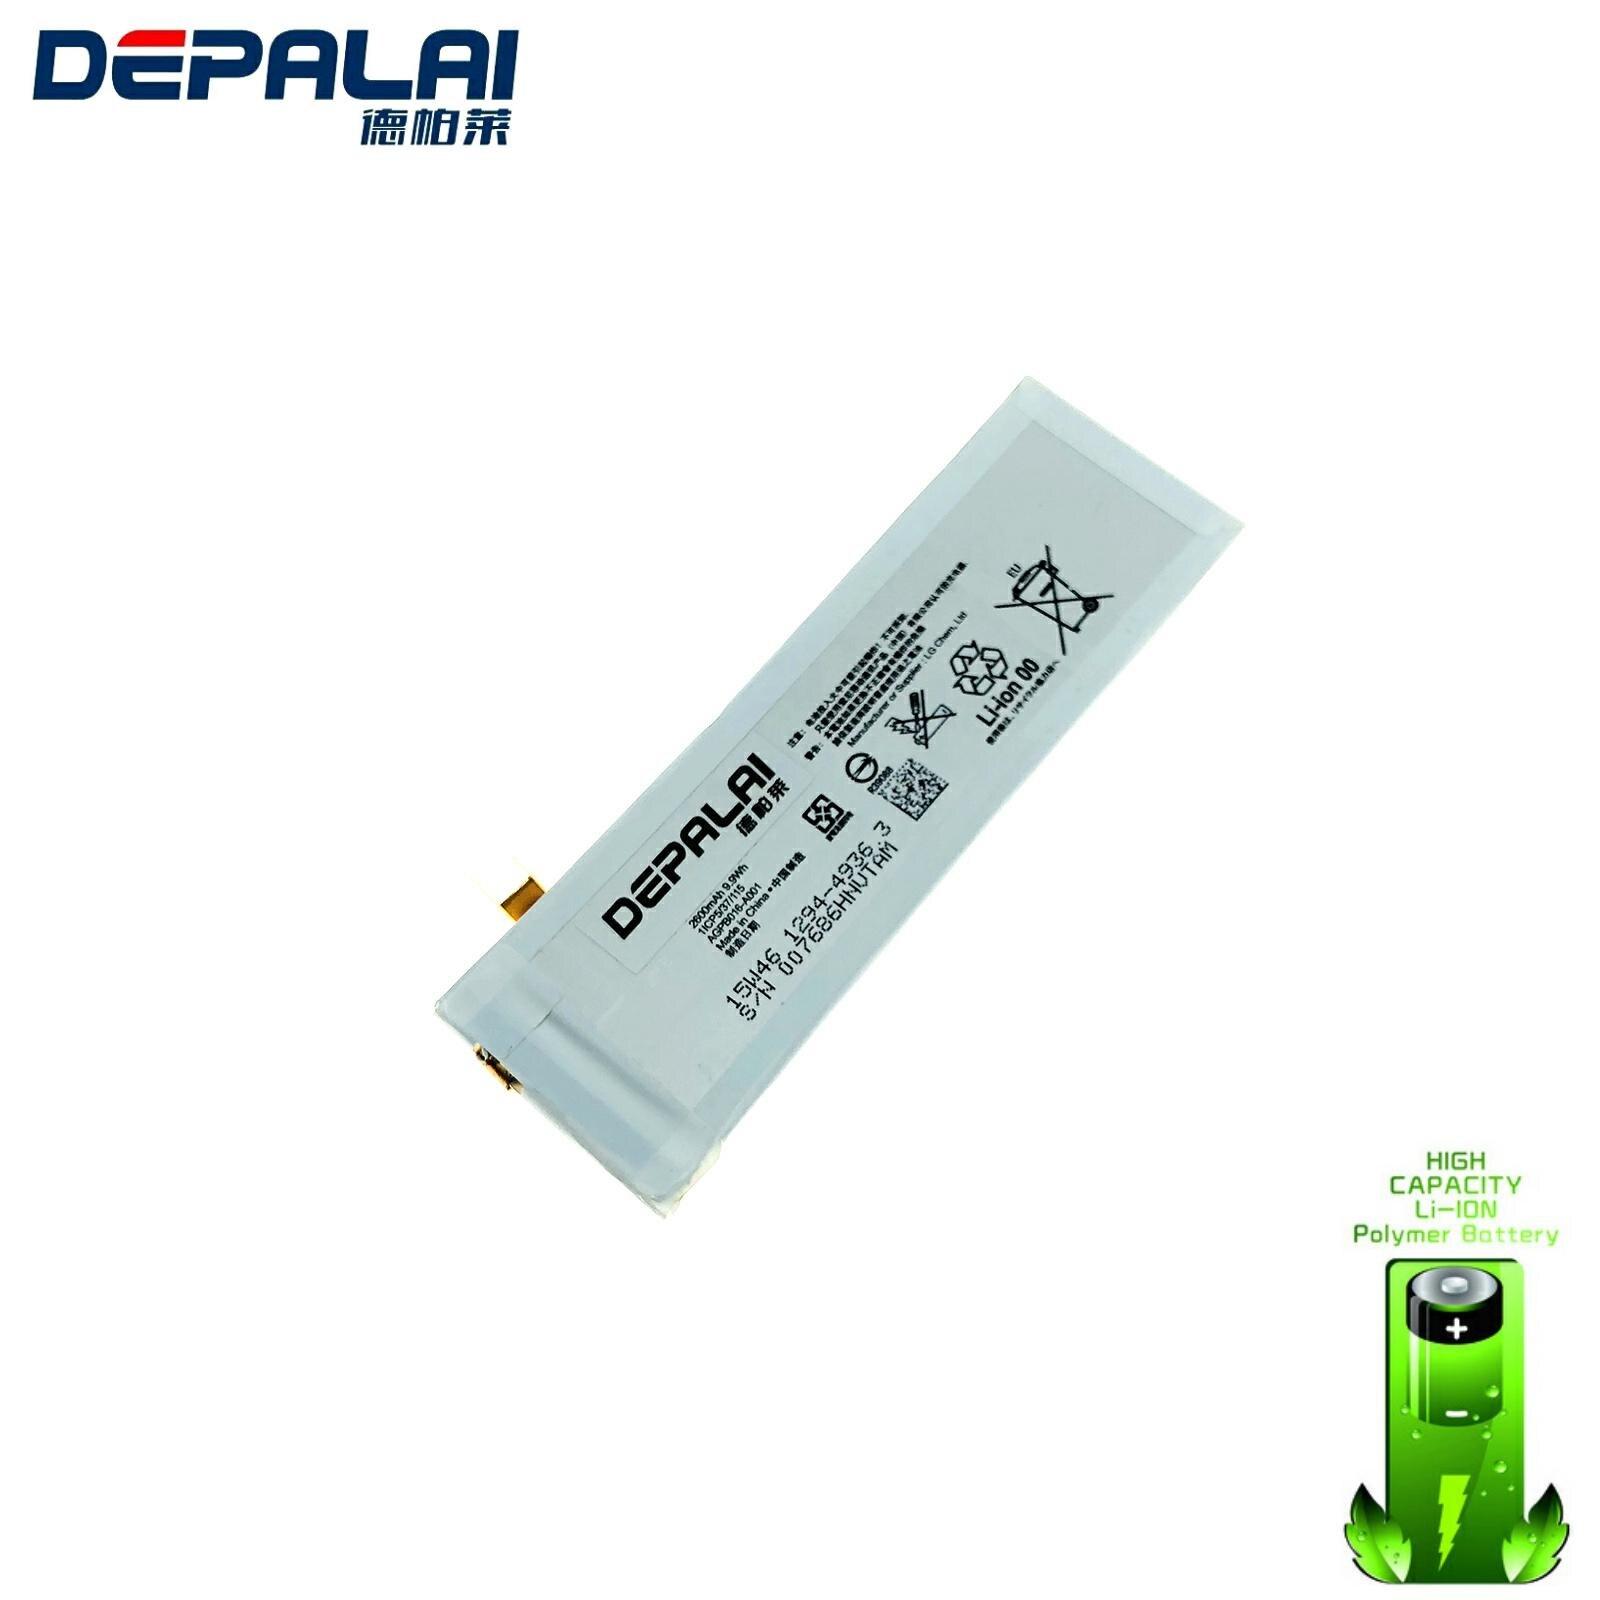 High Quality Rechargeable Li-ion Battery For Sony Xperia E5653 M5 E5603 E5606 E5663 Phone Battery 2600mAh